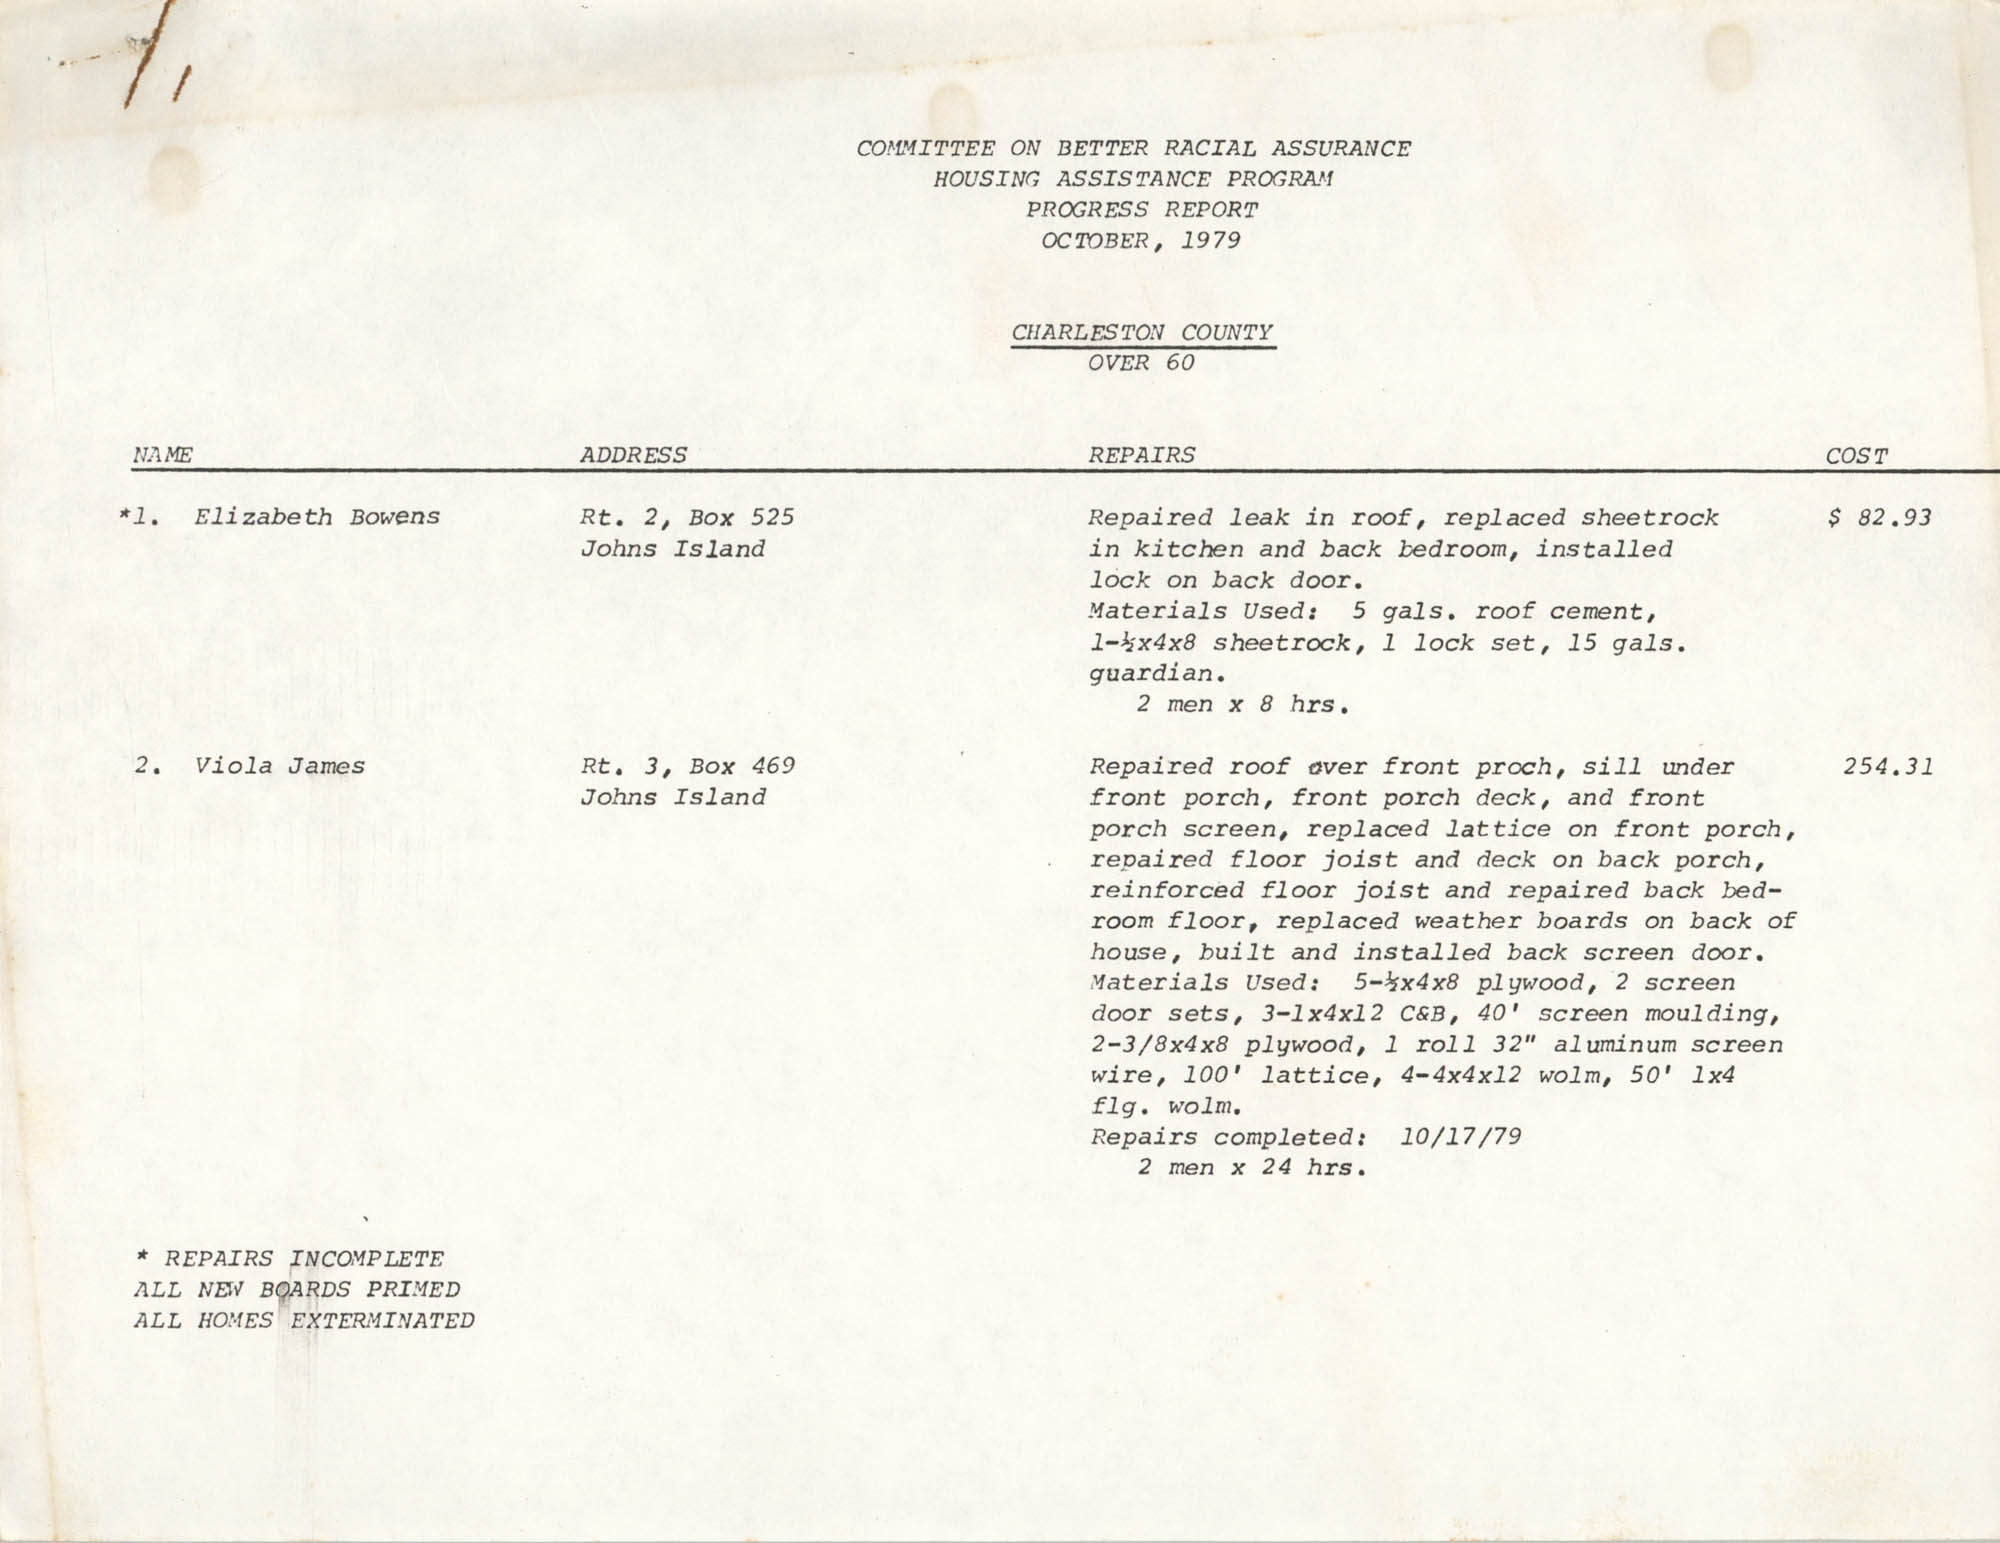 COBRA Housing Assistance Program Progress Report, October 1979